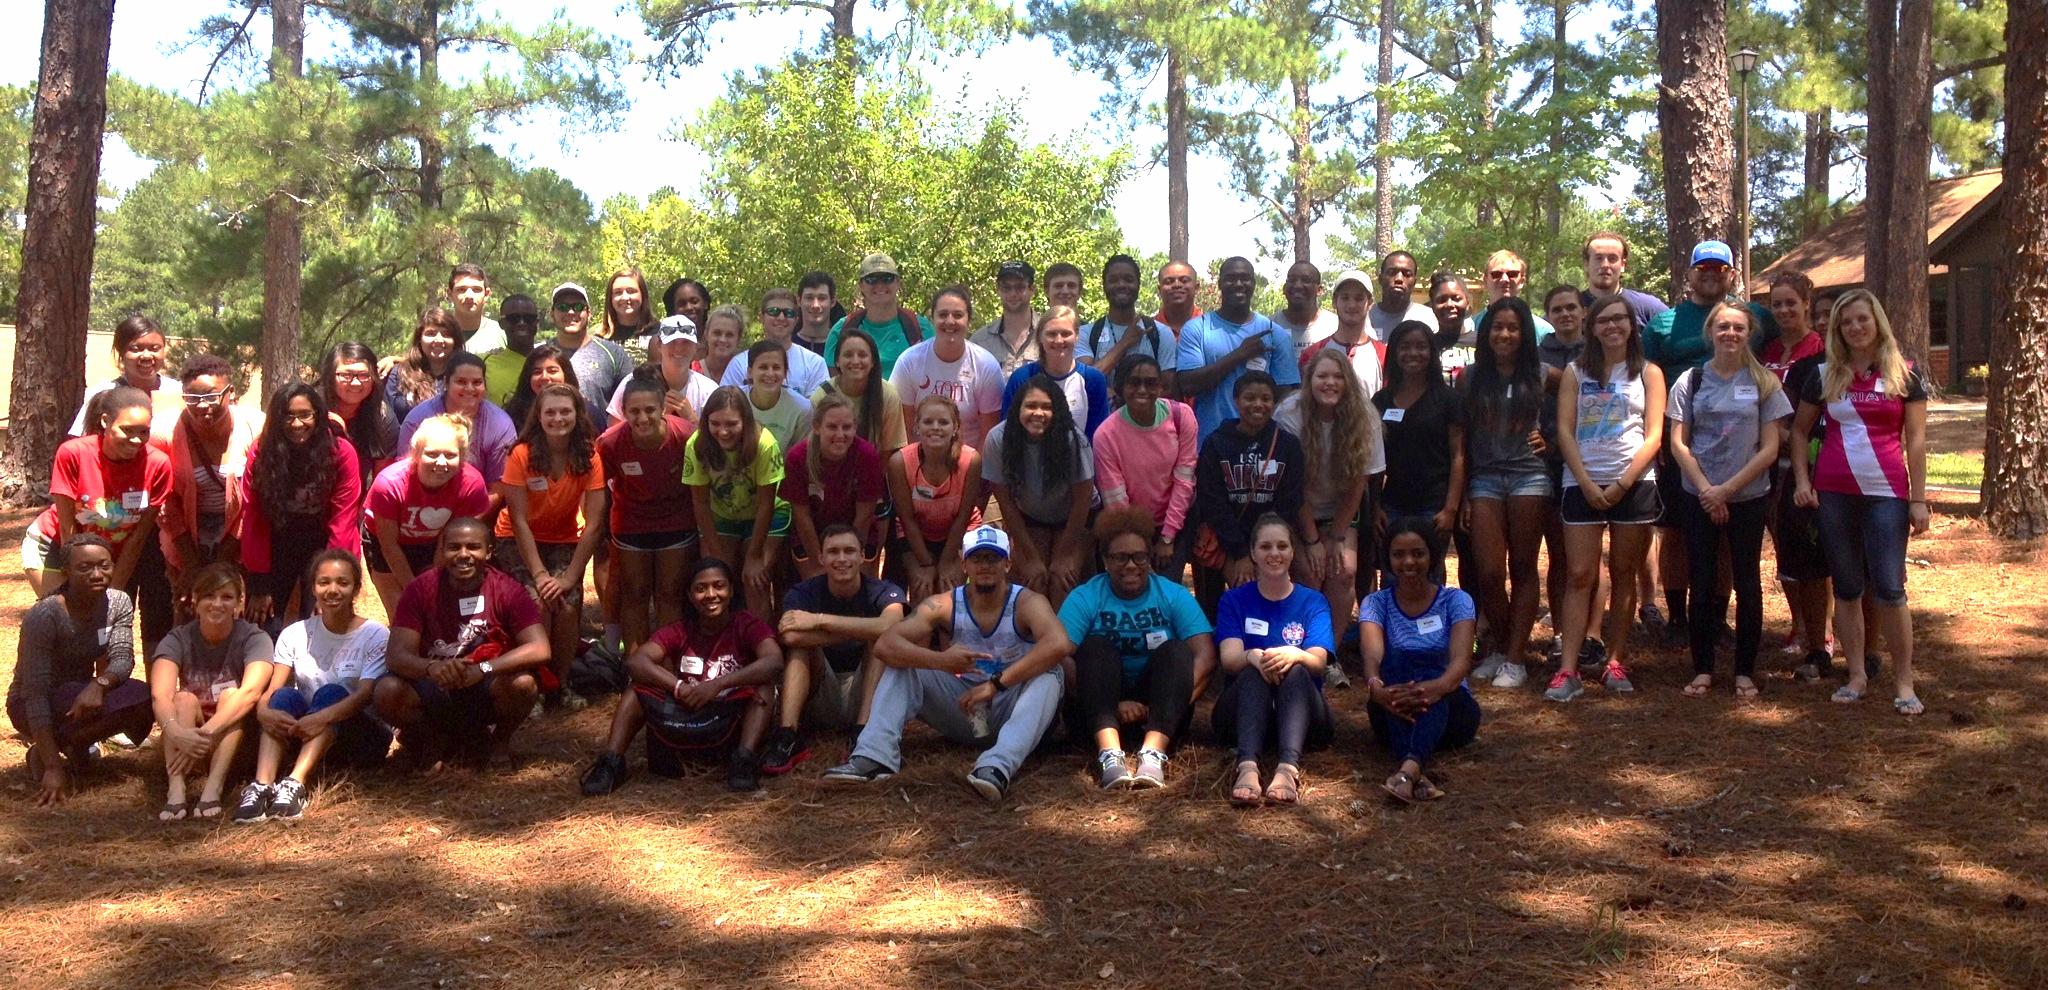 Club retreat at the University of South Carolina - Aiken.